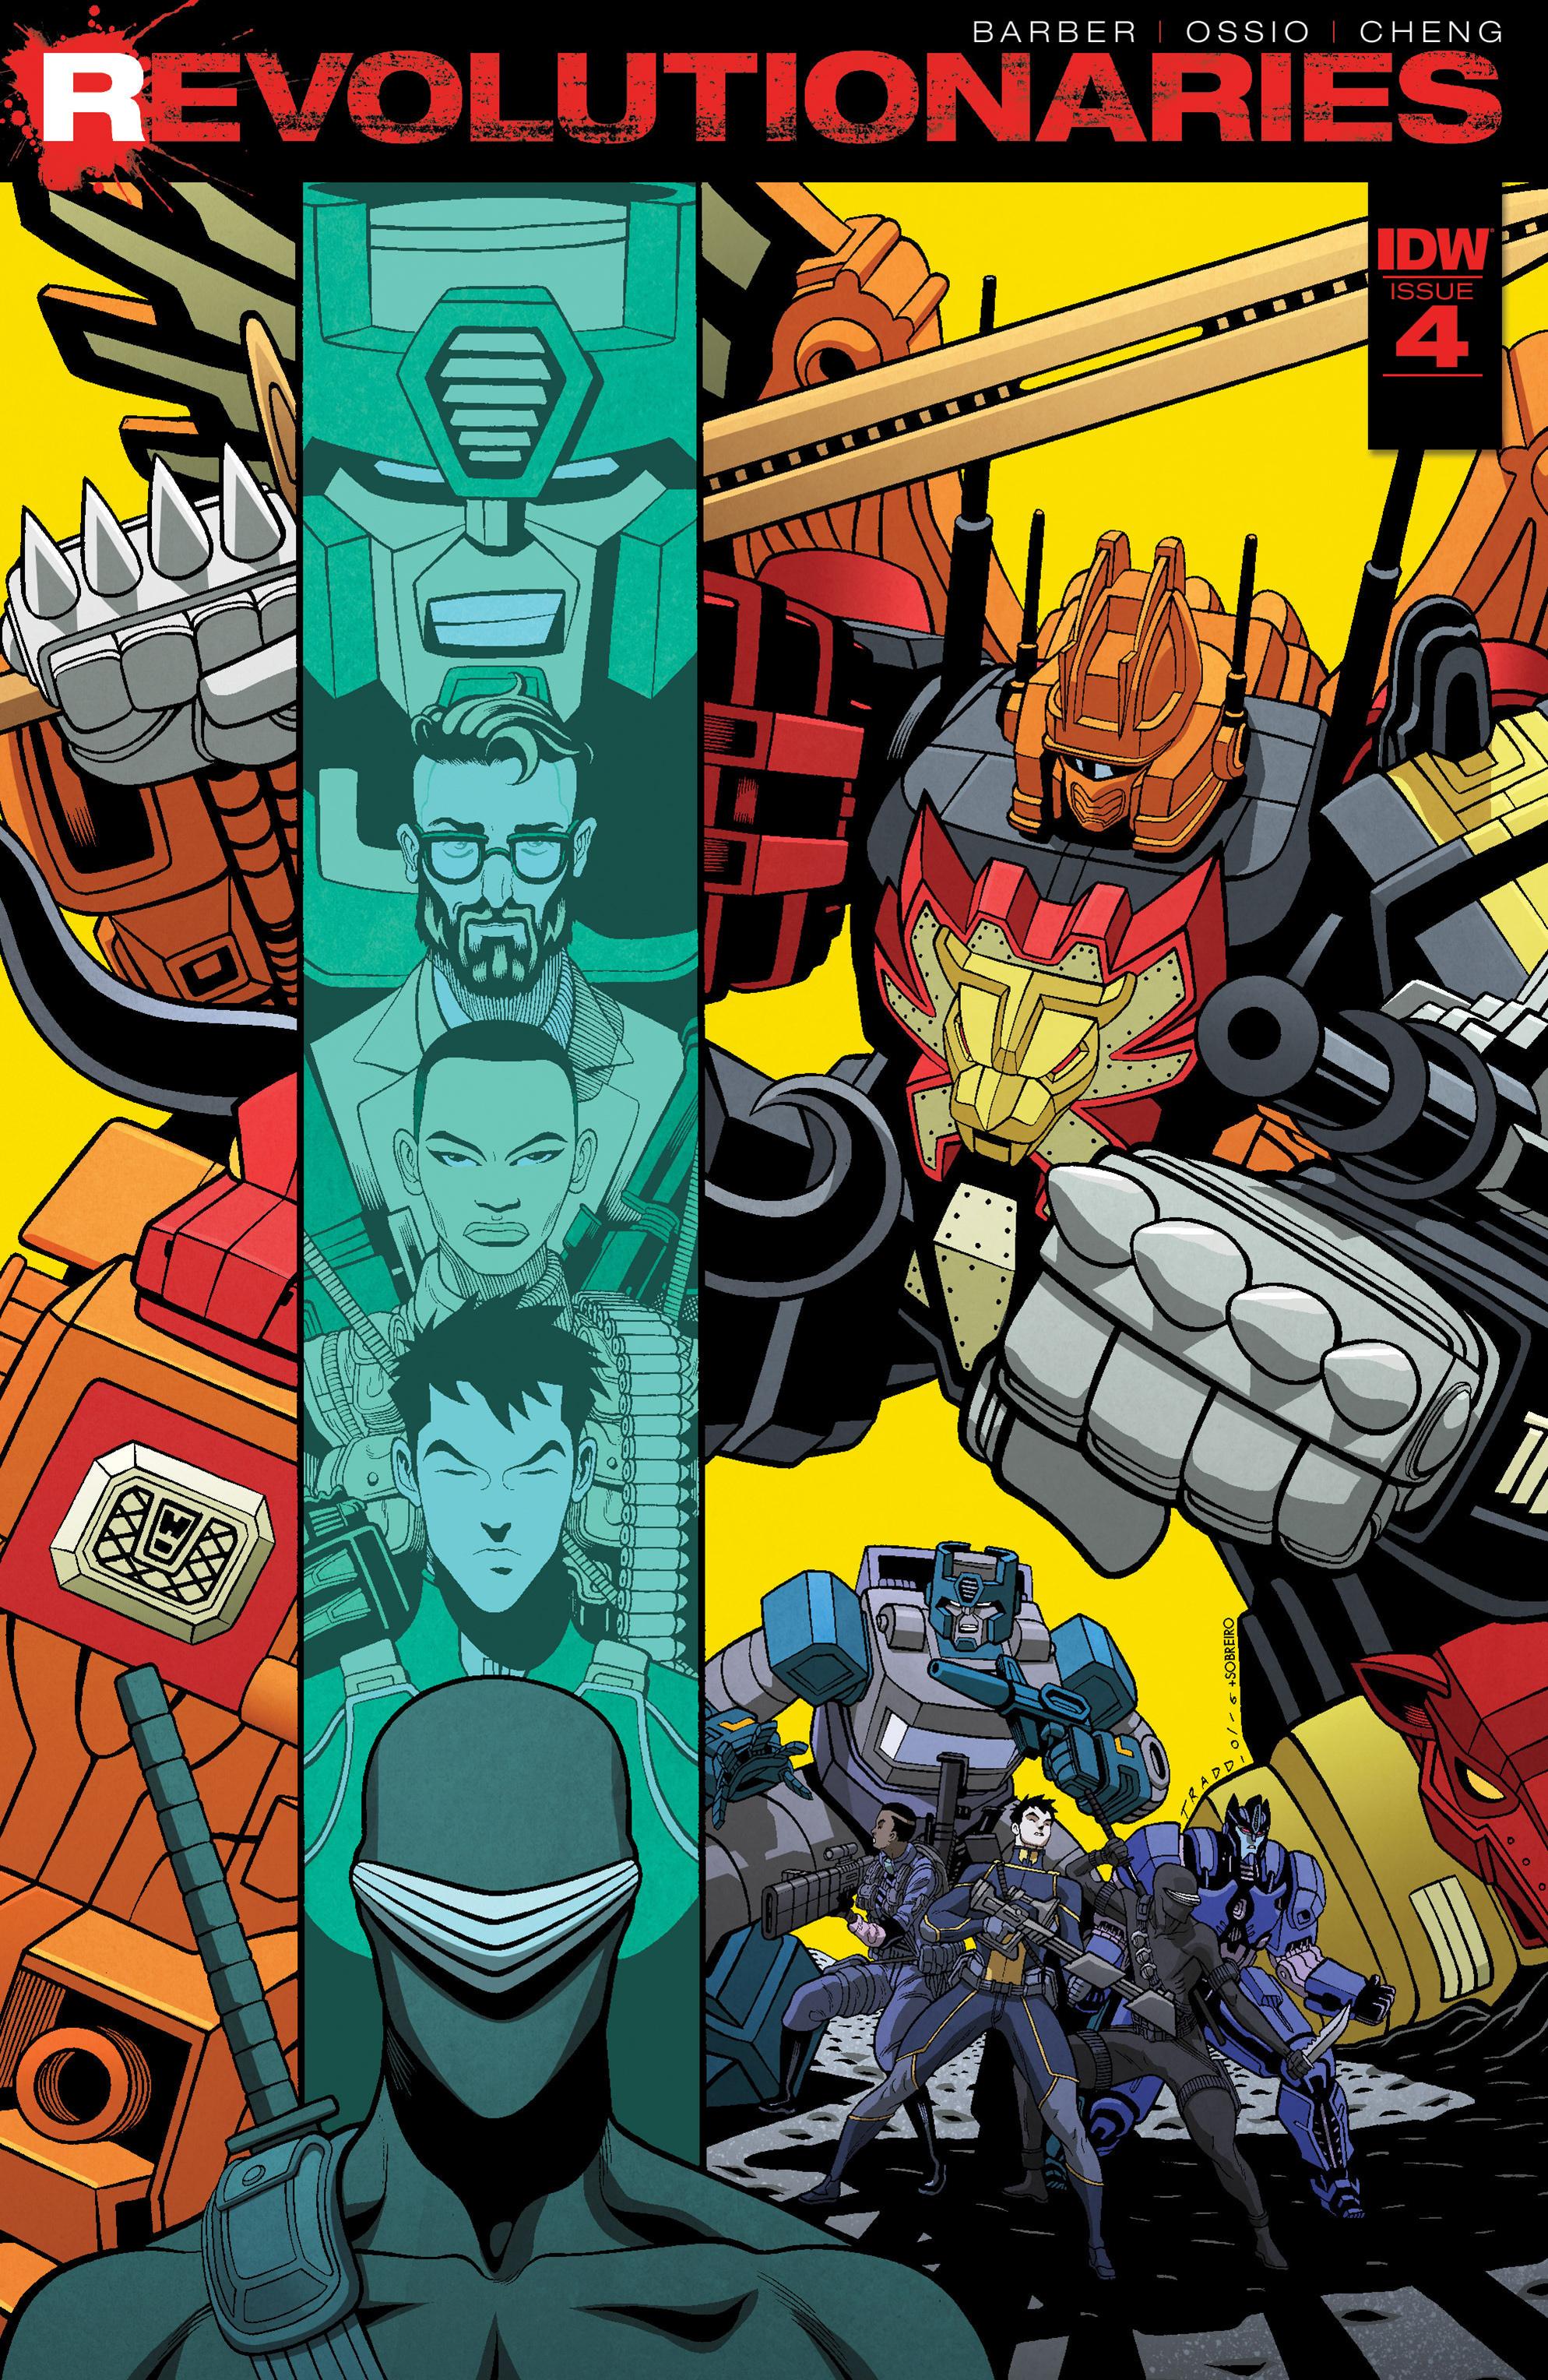 Read online Revolutionaries comic -  Issue #4 - 1